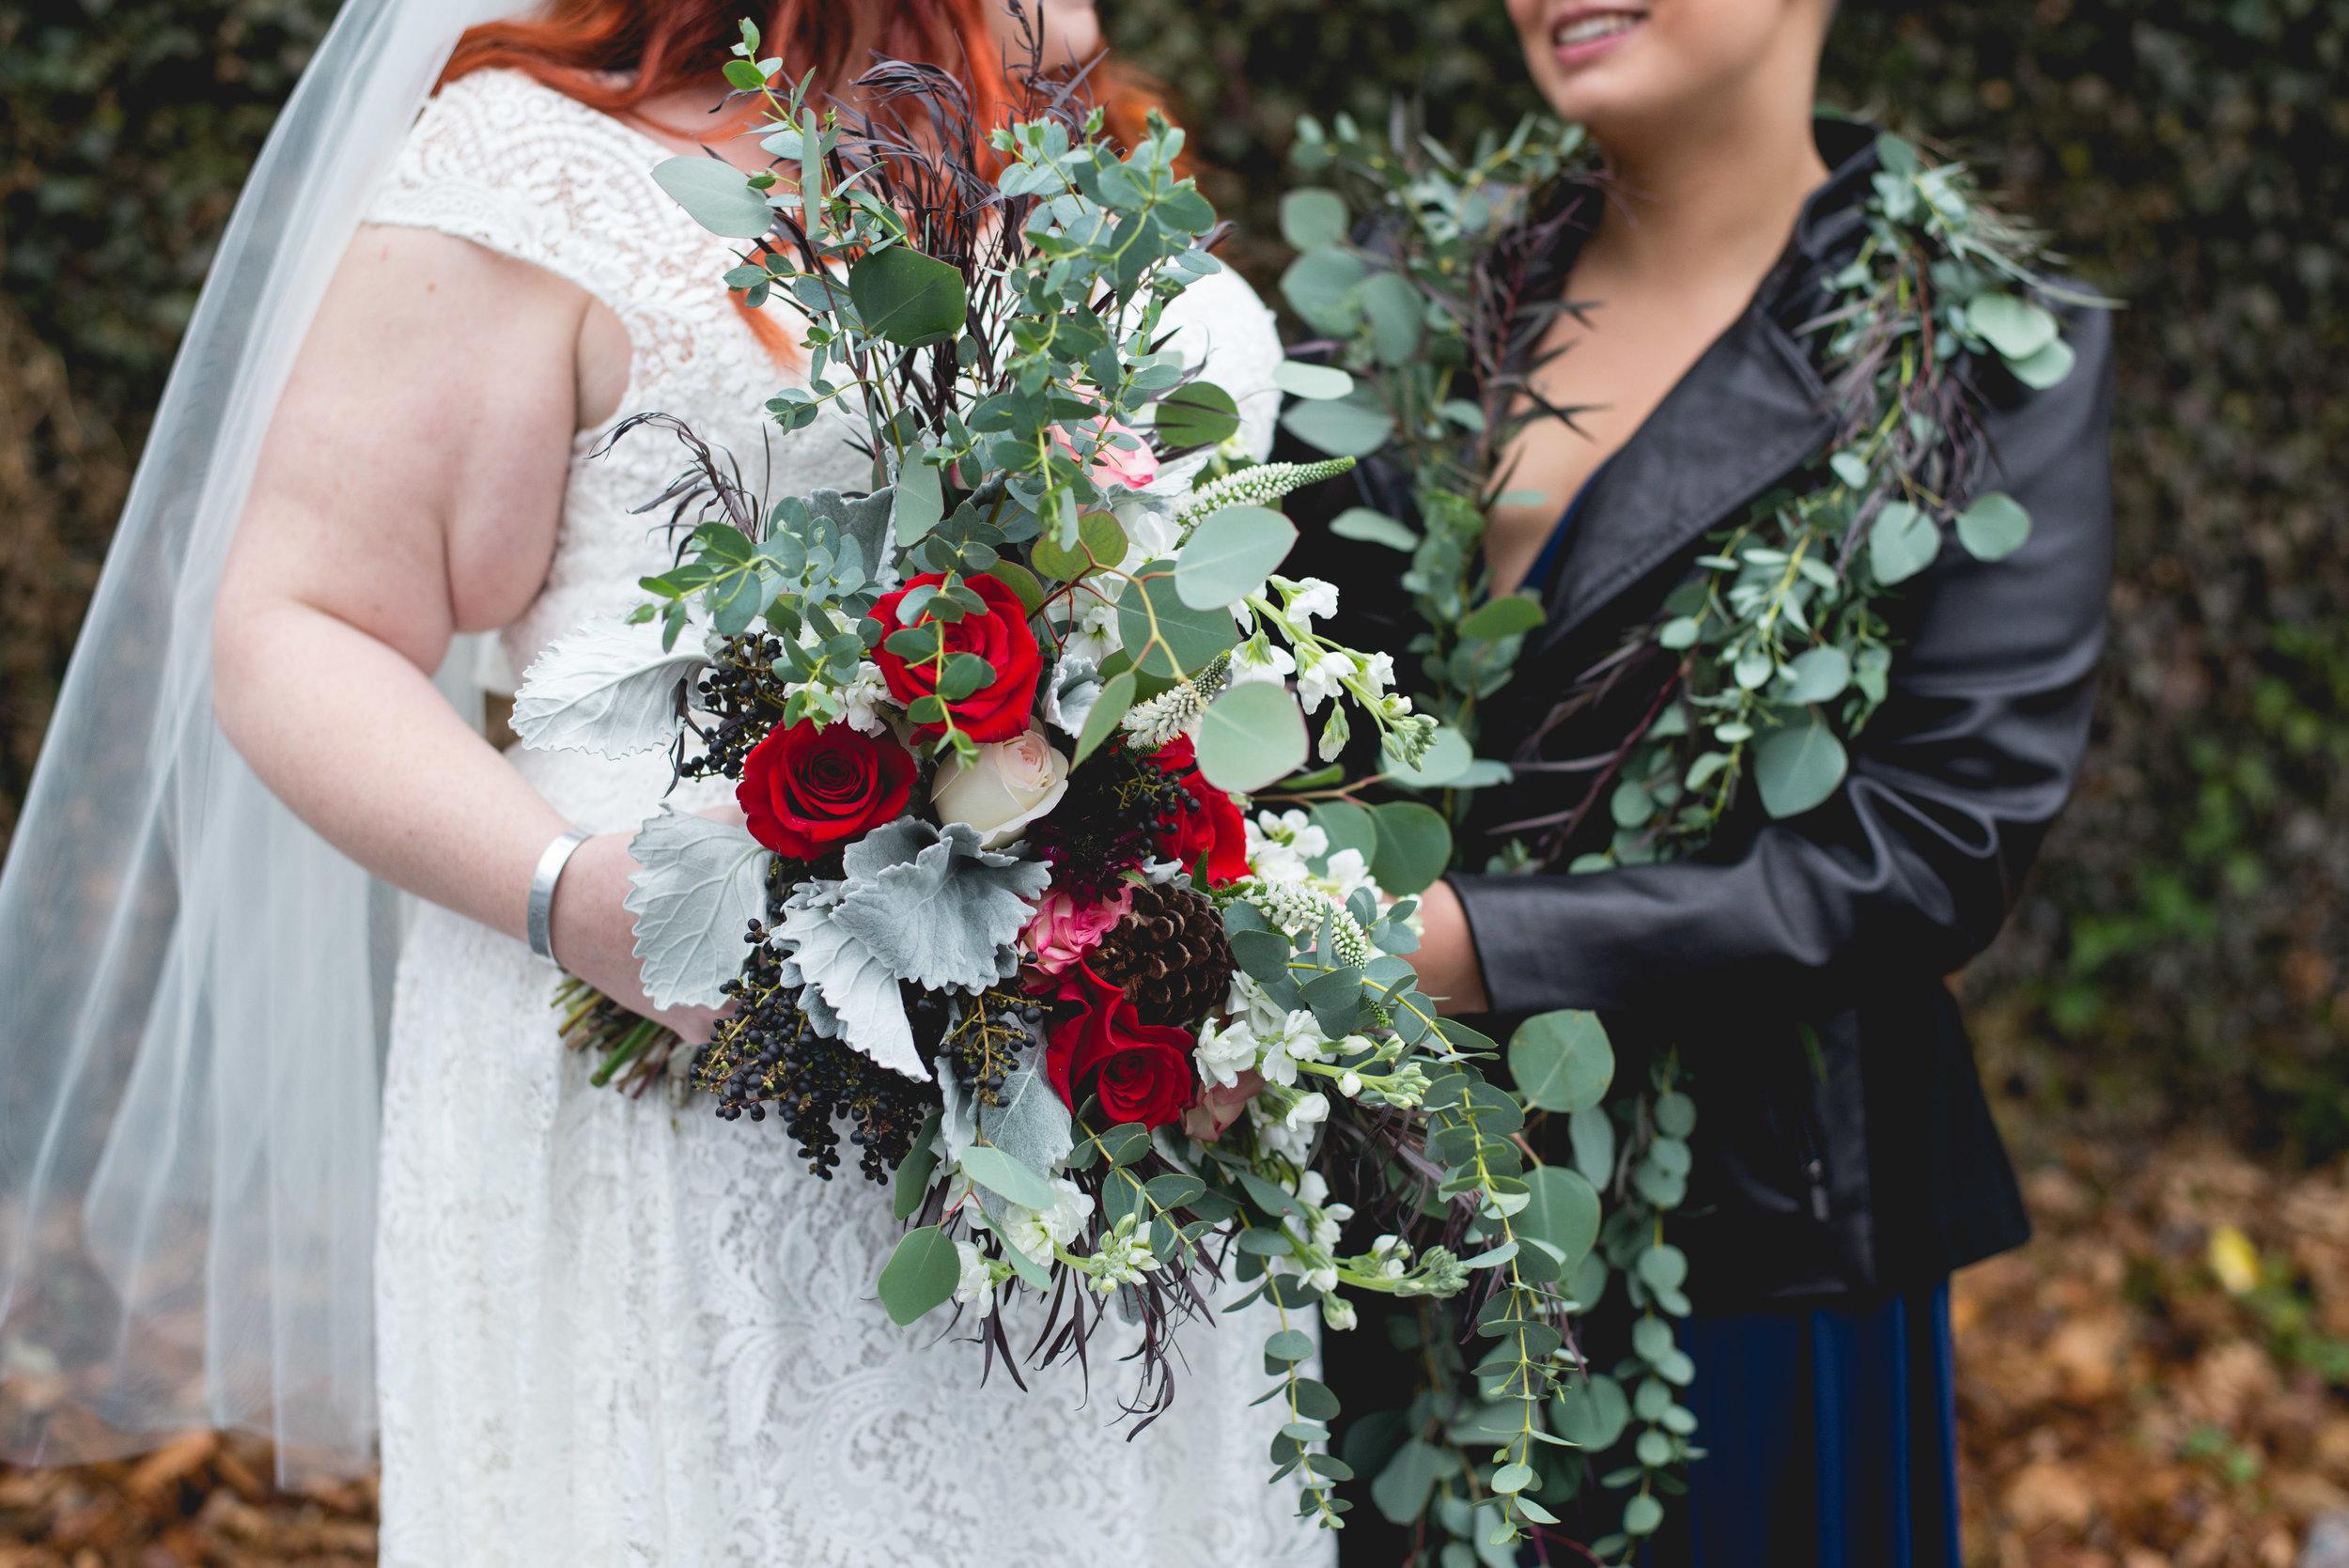 LGBTQ Philadelphia Wedding by Swiger Photography the Lesbian photographer 24